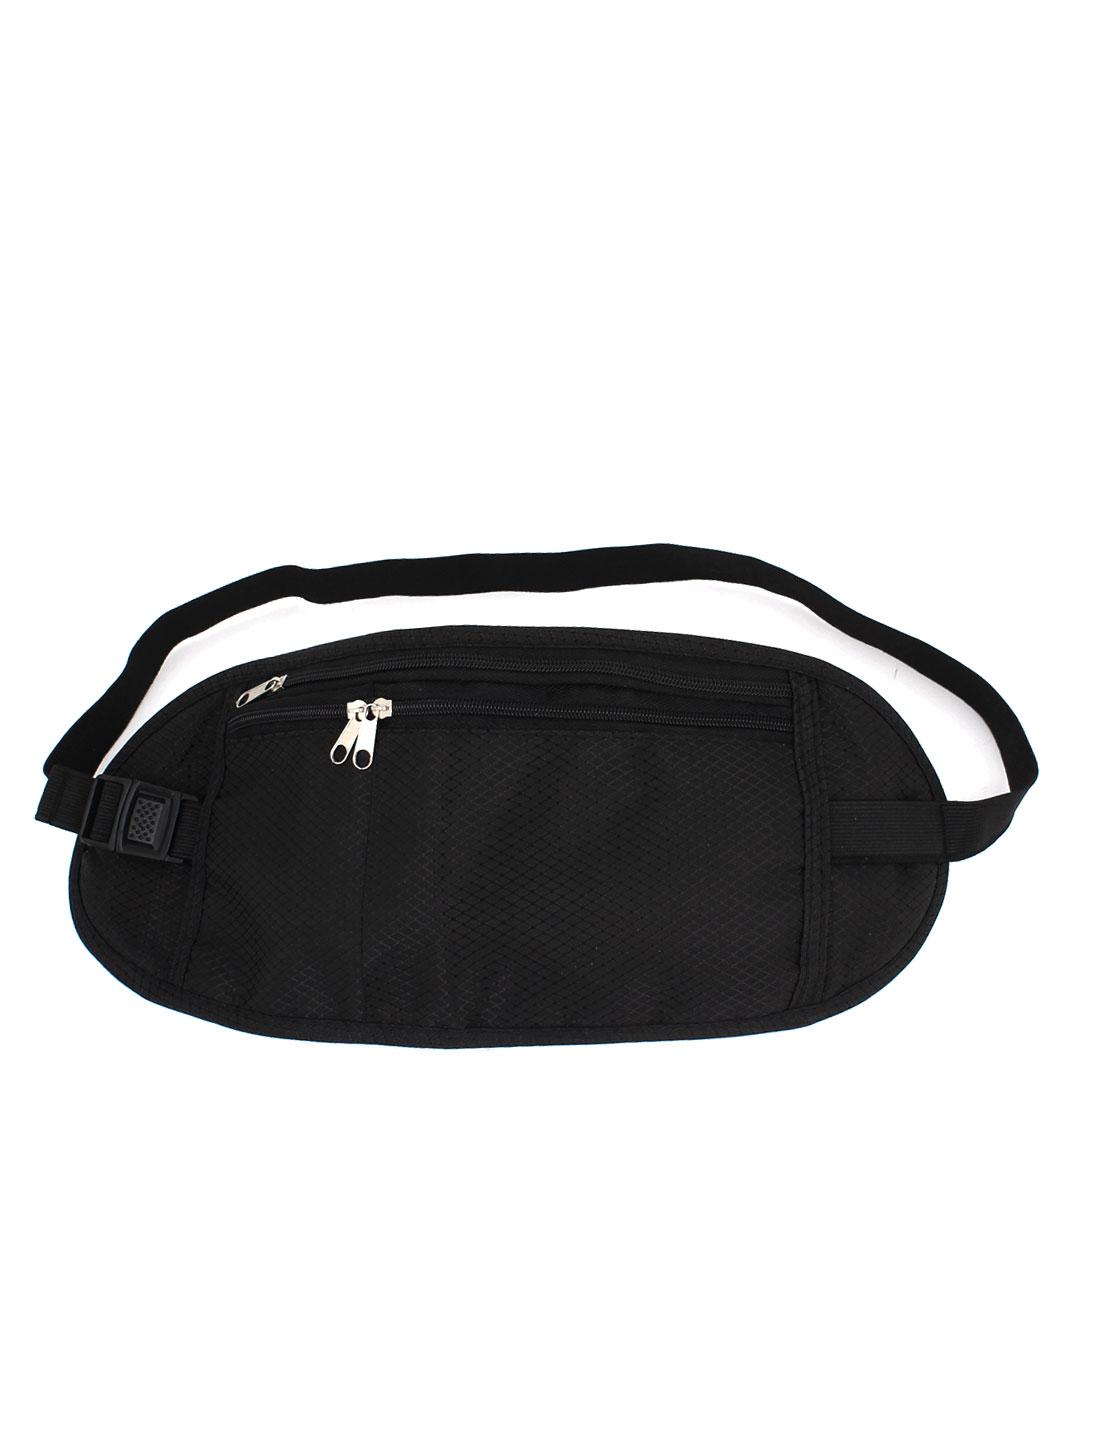 Men Plaids Pattern 2 Pockets Zipper Closure Adjustable Elastic Strap Waist Pack Bag Black